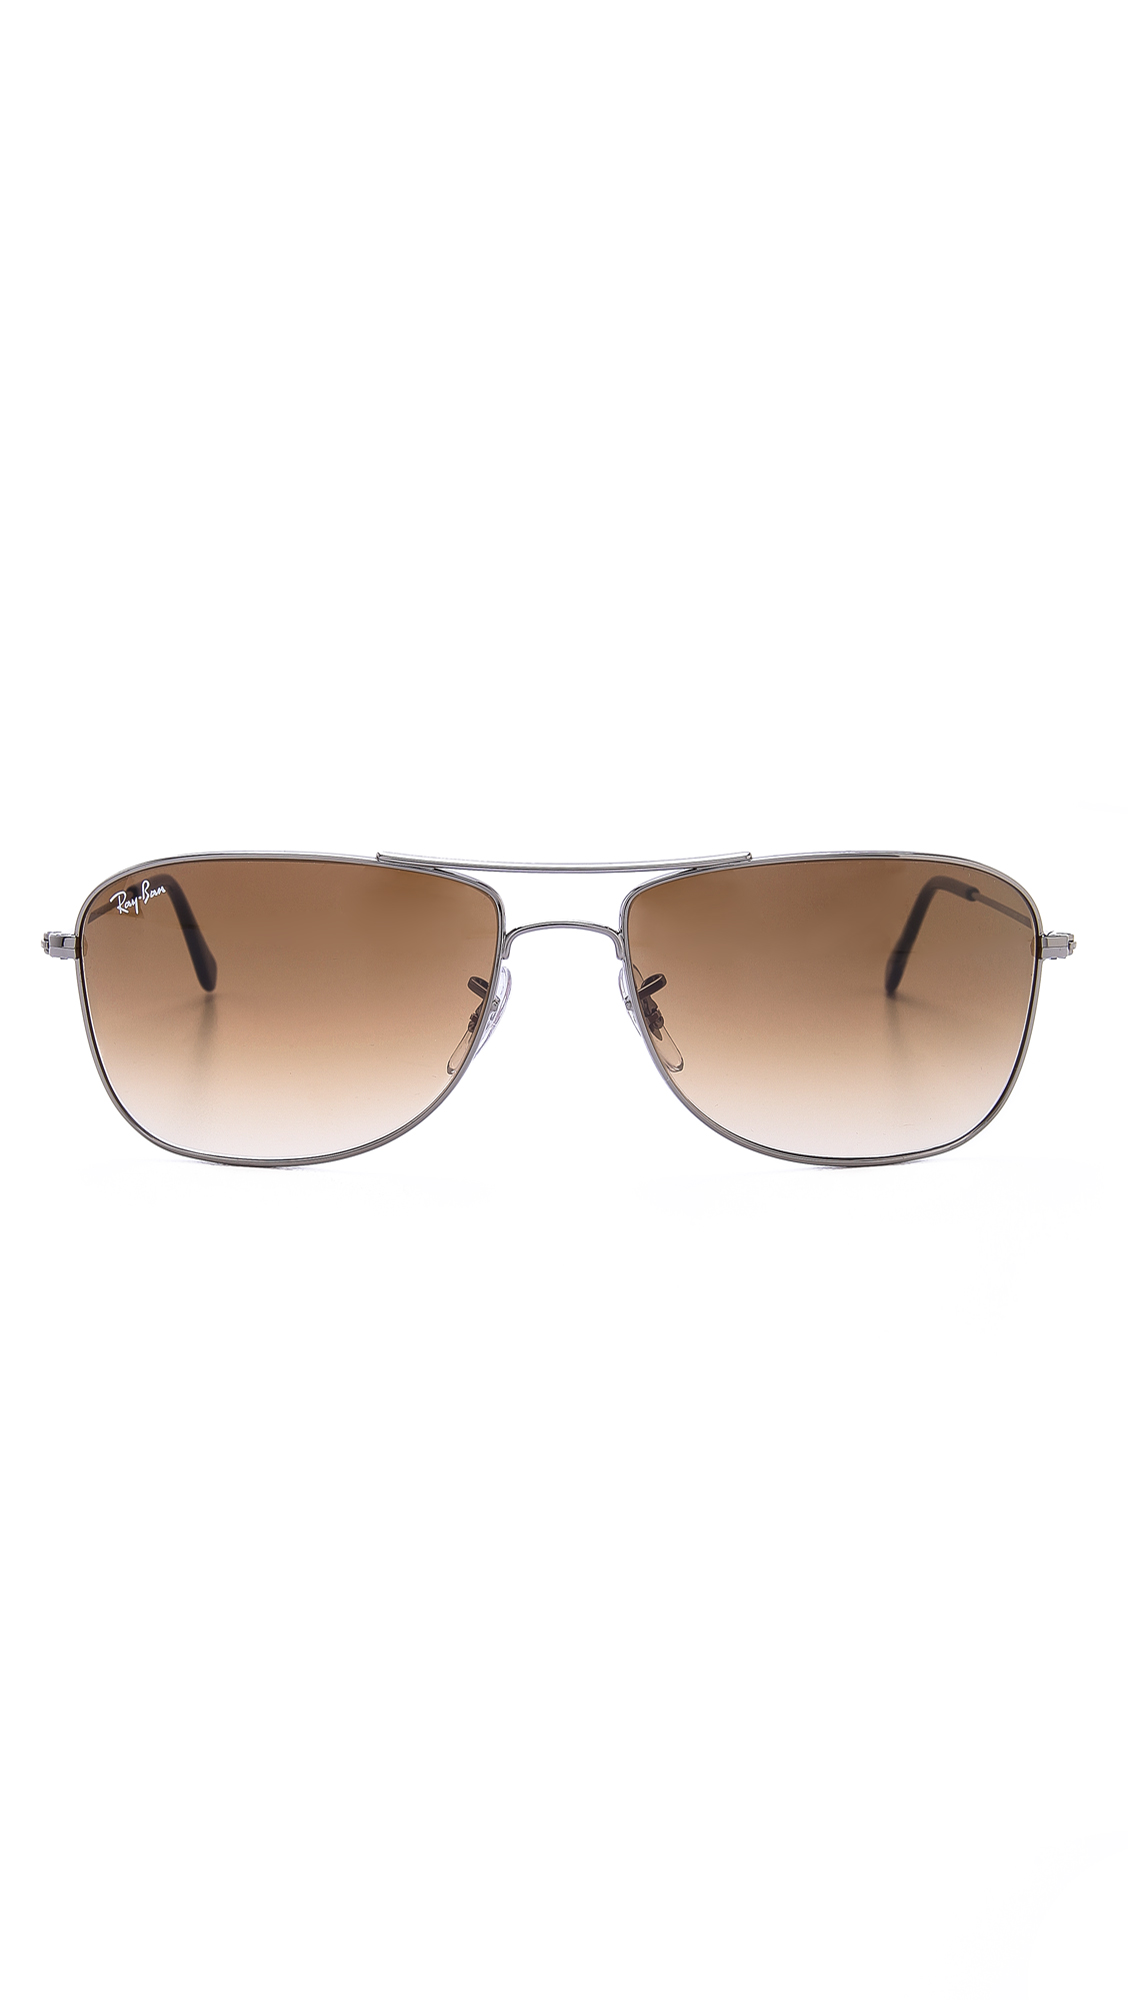 252d4c38dd9 ... real lyst ray ban caravan sunglasses in gray for men aeda5 22833